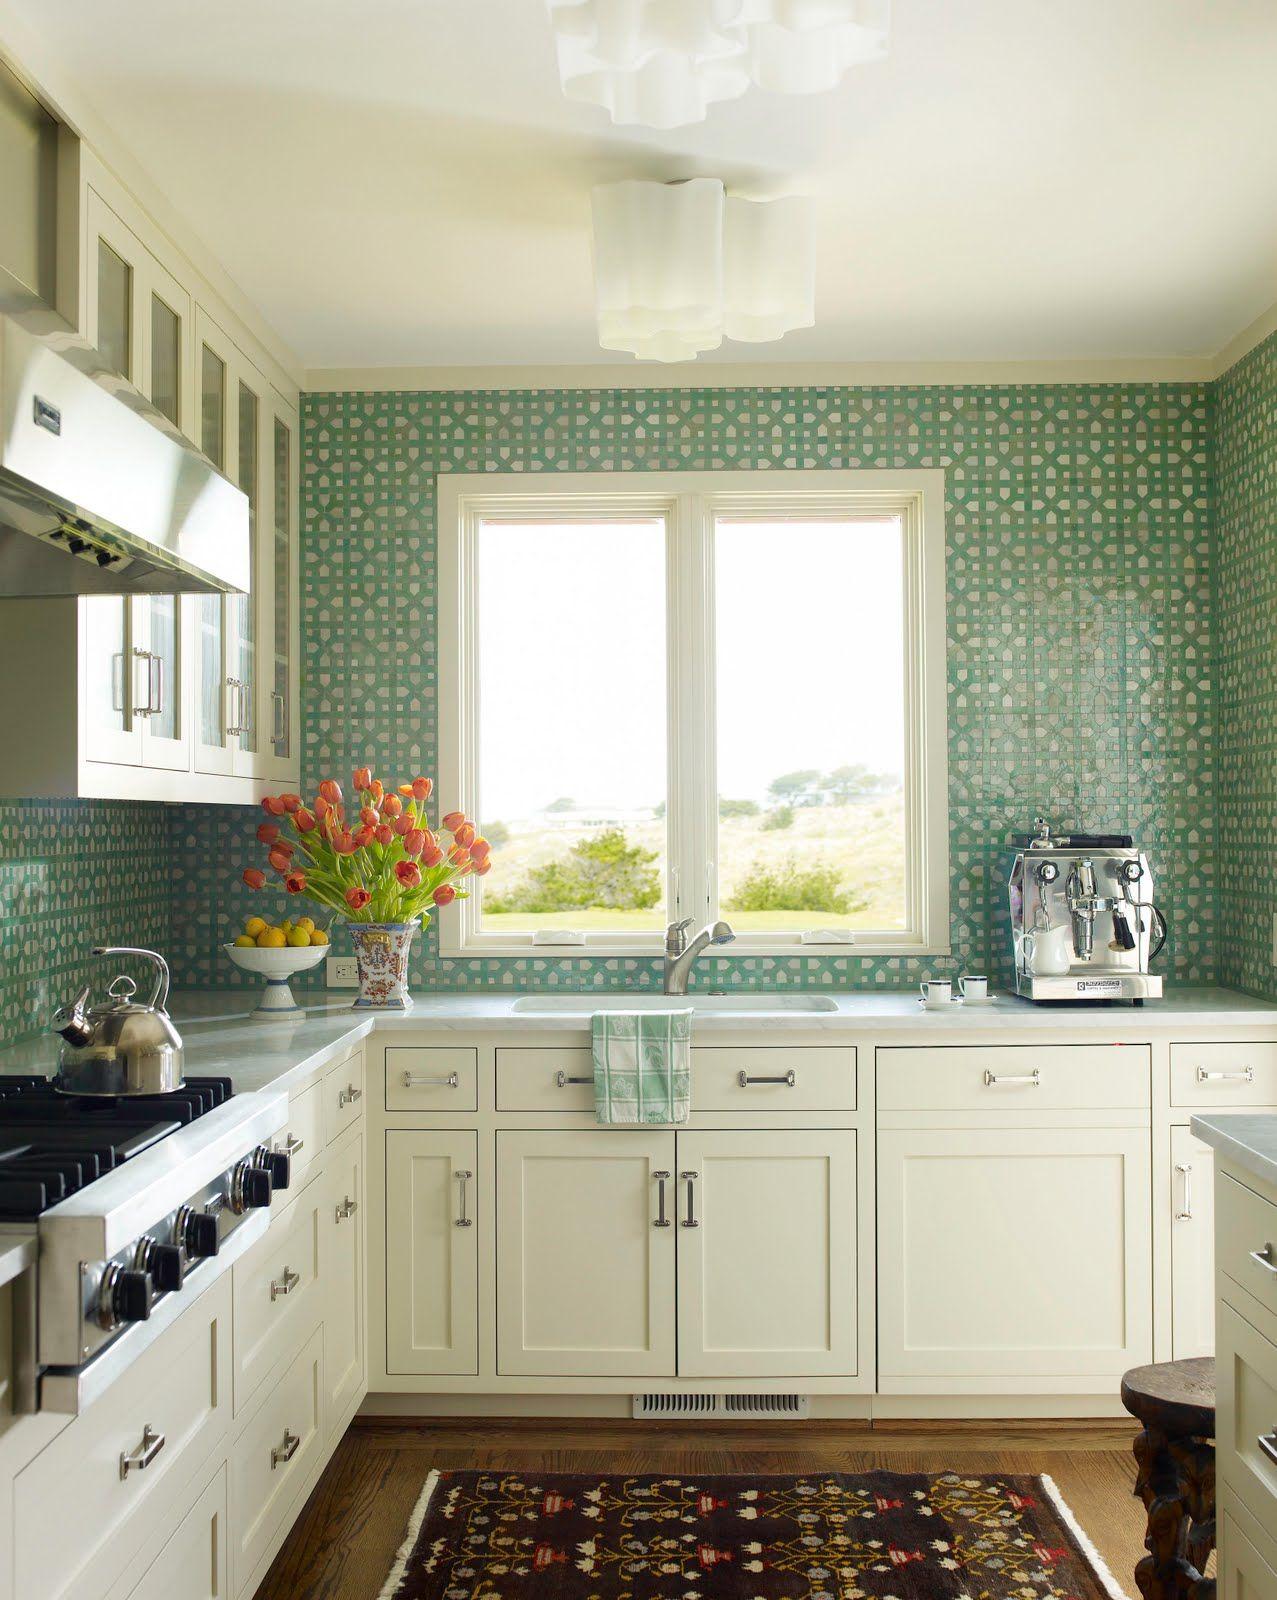 Moroccan Style Kitchen Tiles Aqua Green Tile Backsplash Moroccan Inspired Extend The Tile All